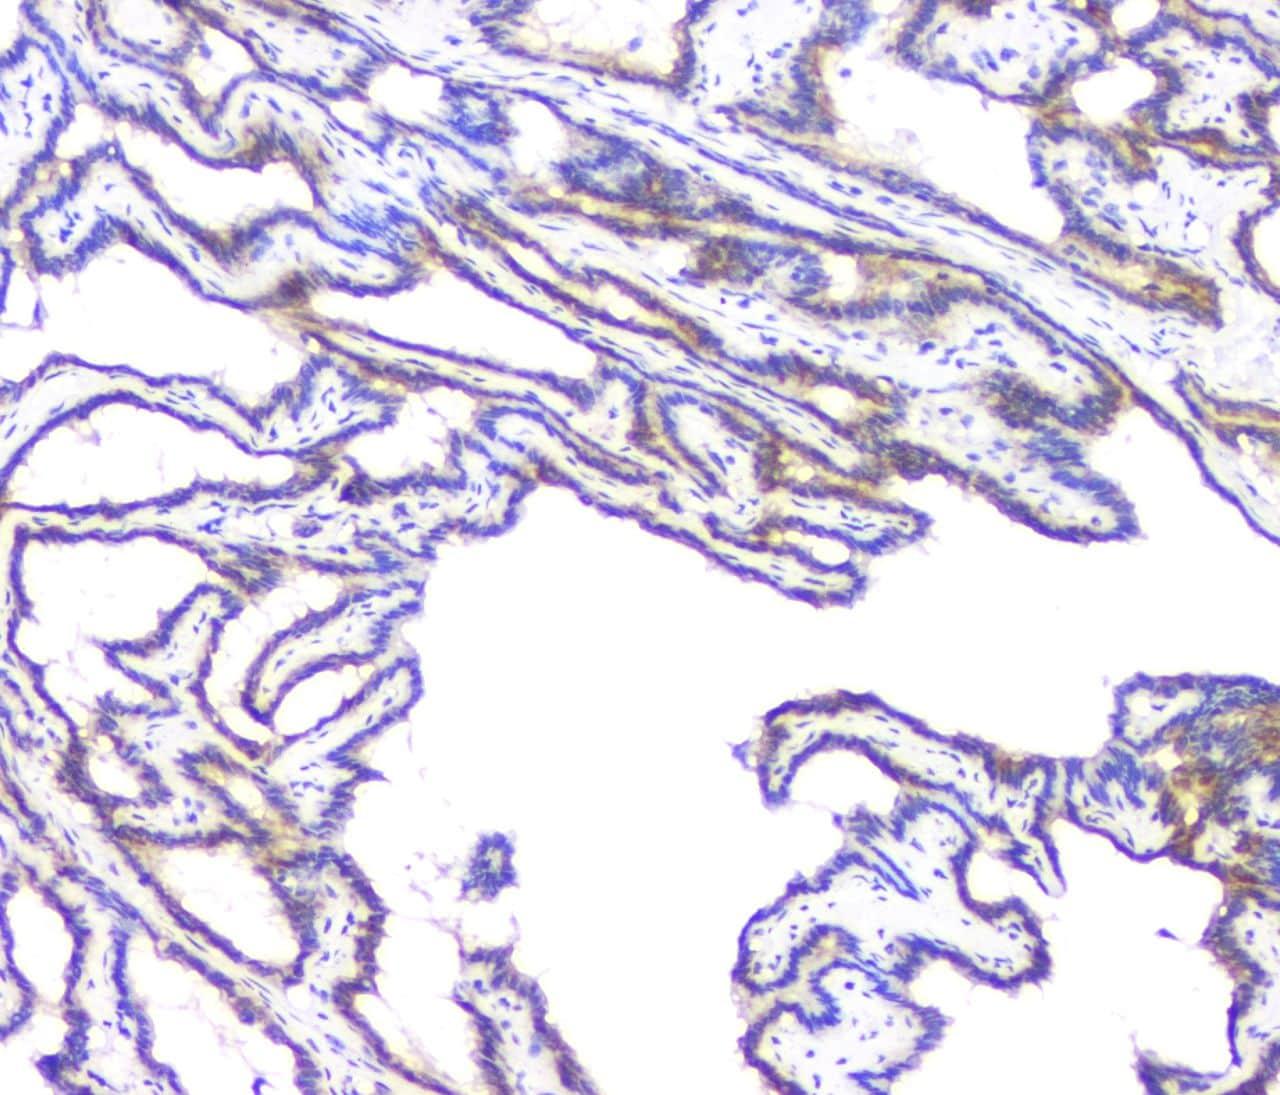 BAG6 Antibody in Immunohistochemistry (Paraffin) (IHC (P))